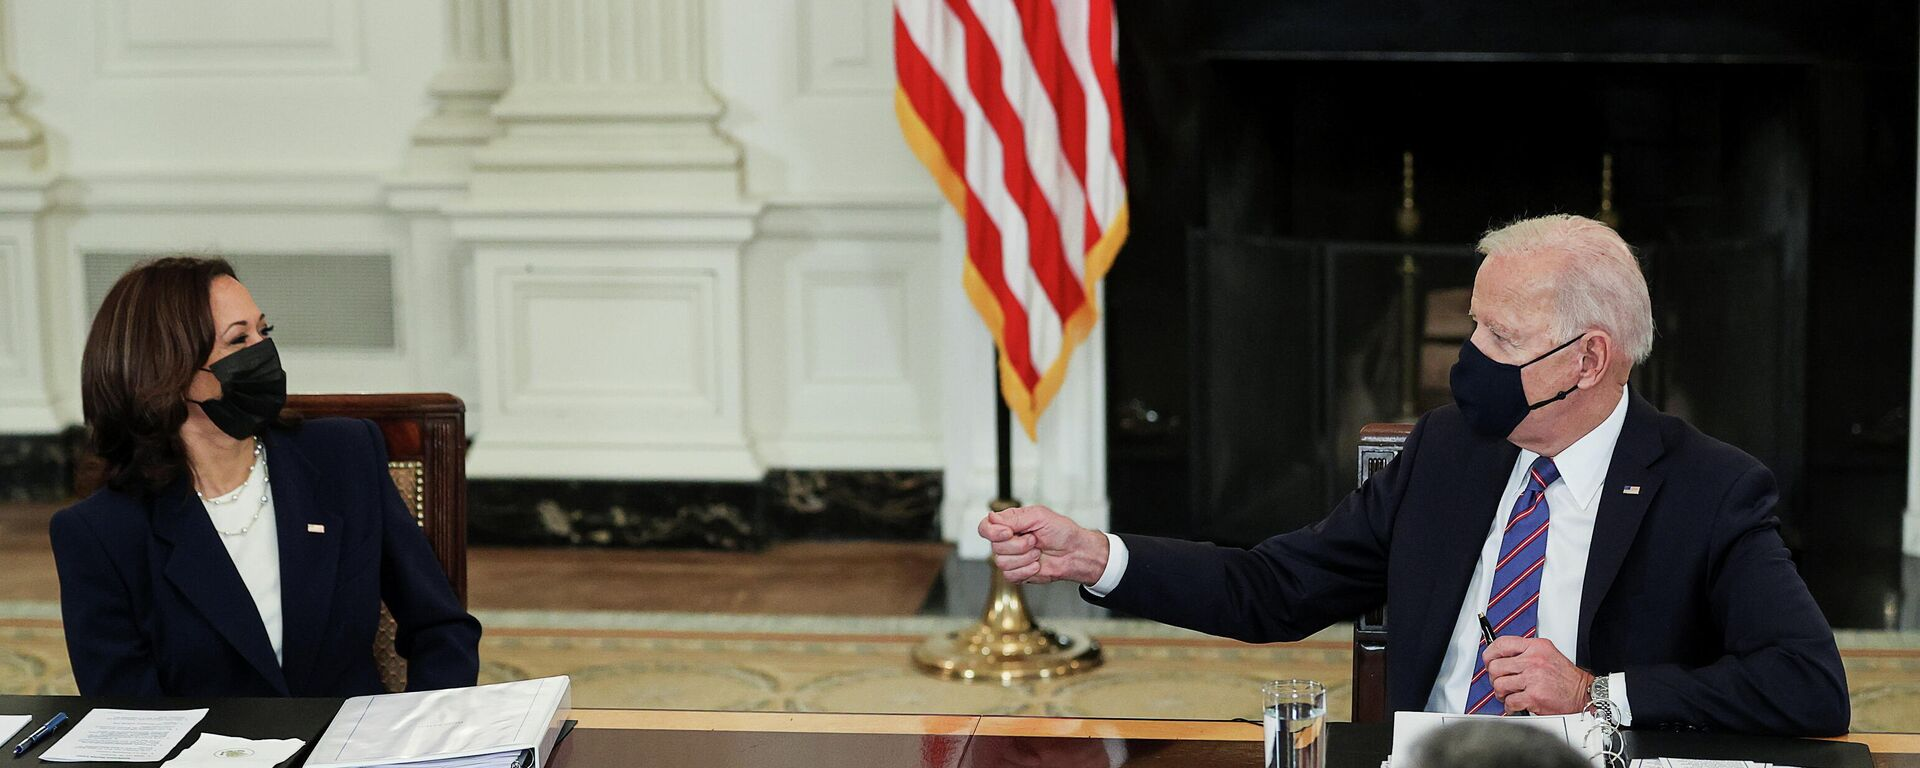 Joe Biden, presidente de EEUU, y Kamala Harris, vicepresidenta - Sputnik Mundo, 1920, 26.03.2021